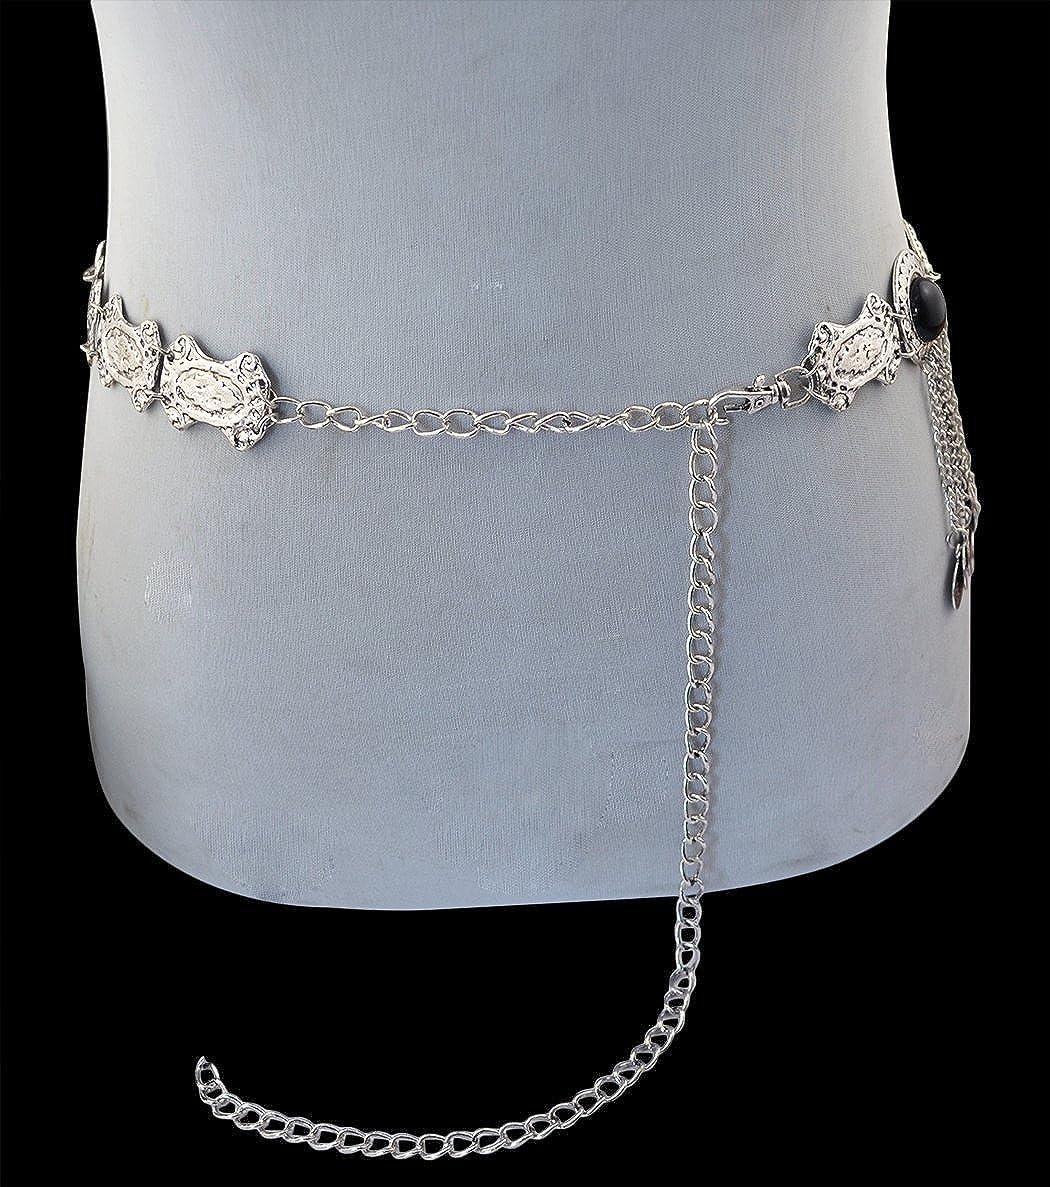 Ethnic Gypsy Bohemia Turkish Silver Engraving Belt Belly Body Chain Jewelry